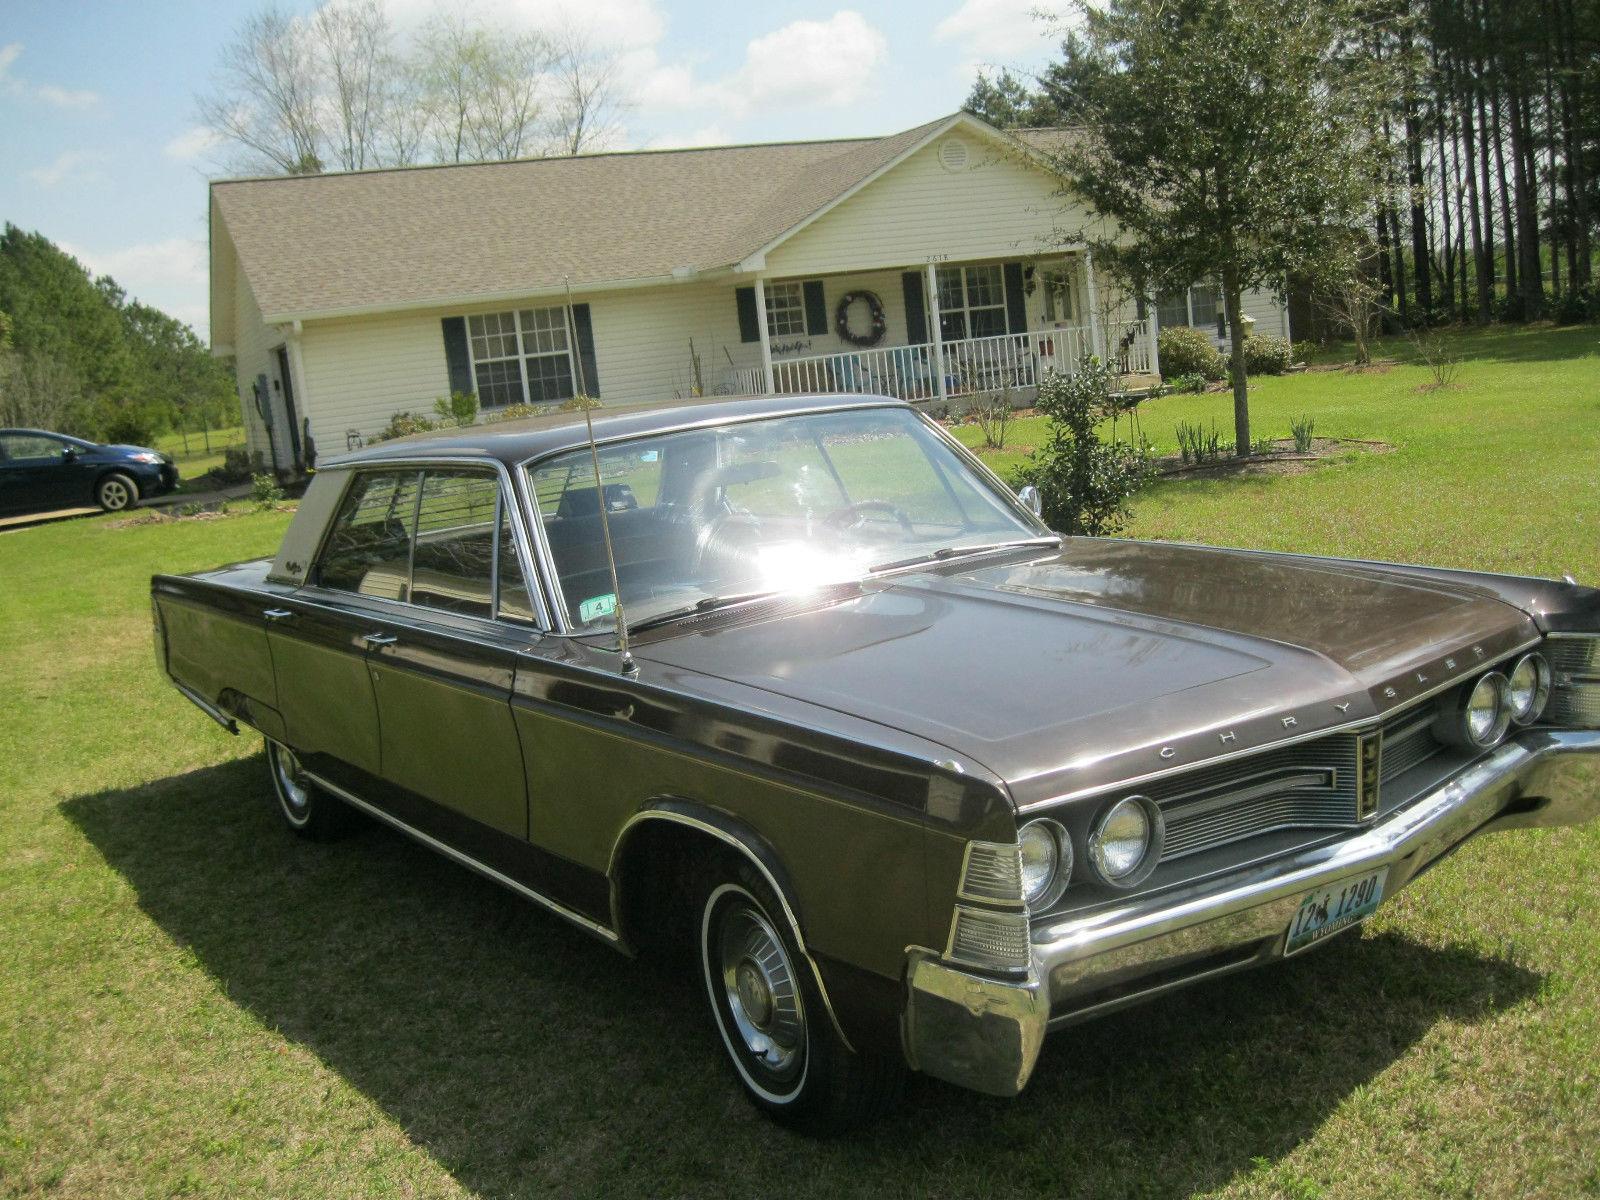 1967 Chrysler New Yorker Base 7 2L, 4 Door Hardtop for sale in